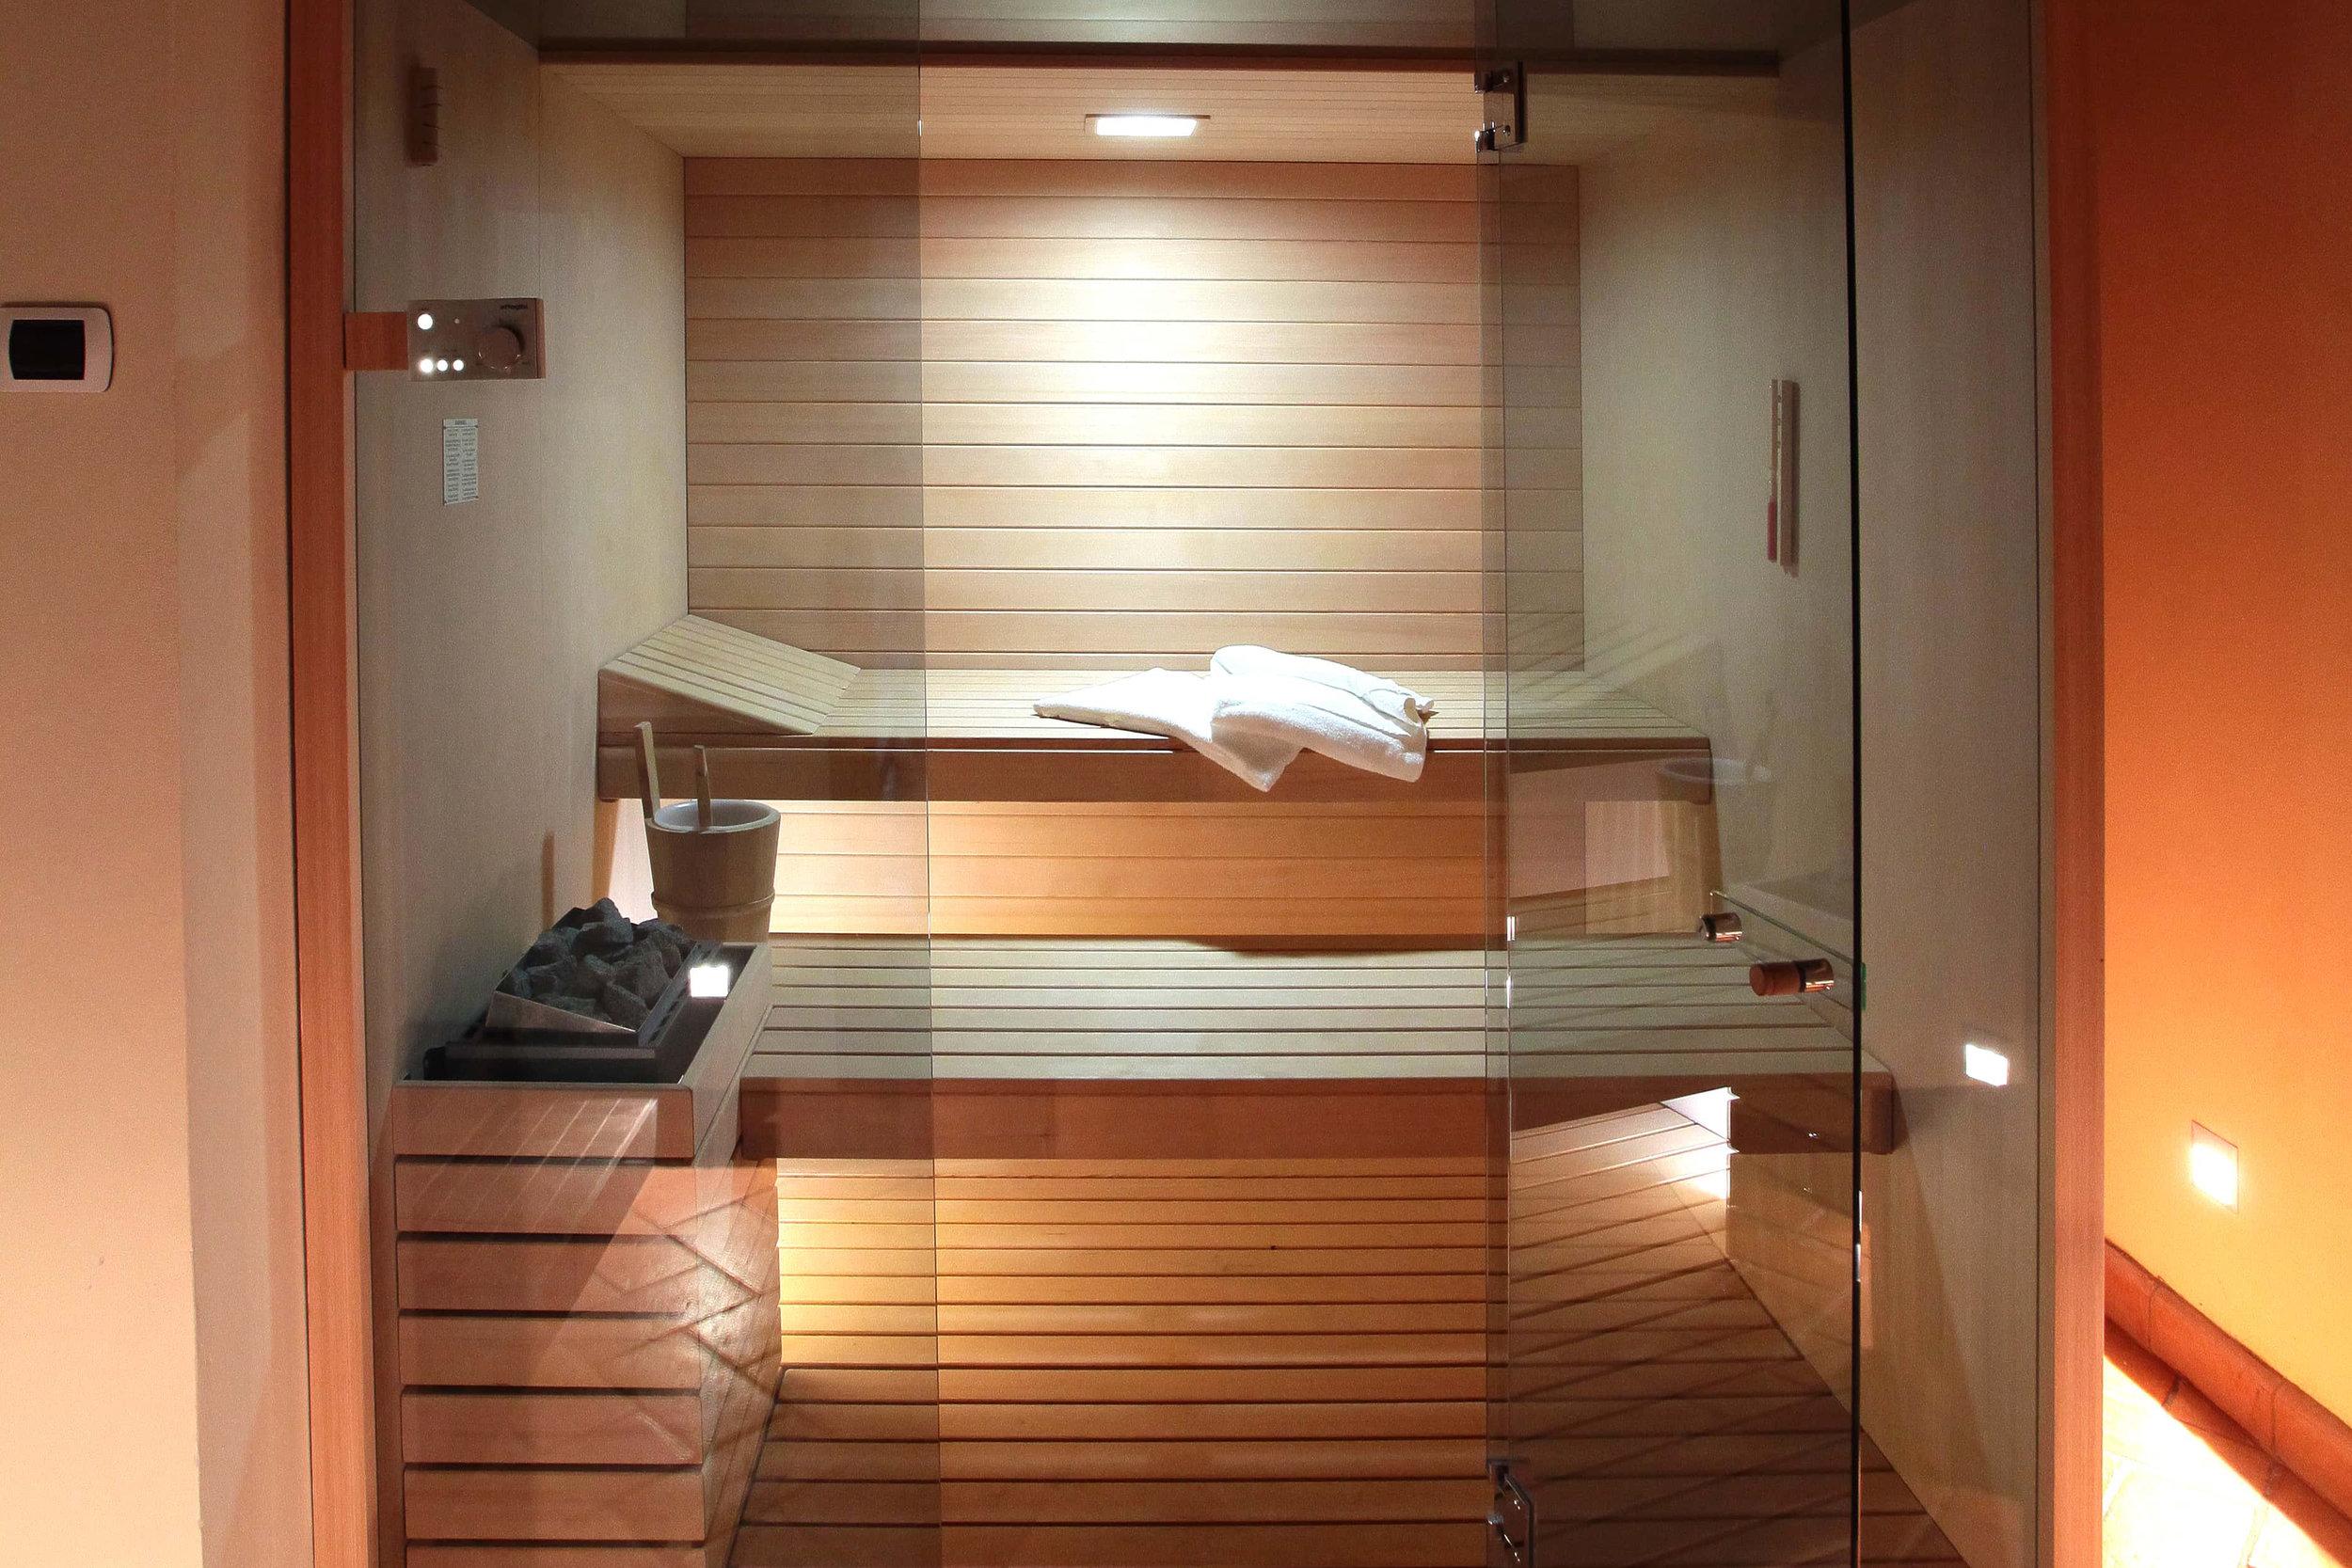 dimora-gallery-mormoraia-agriturismo-hotel-vacanza-bb-relax-camere-sauna.jpg